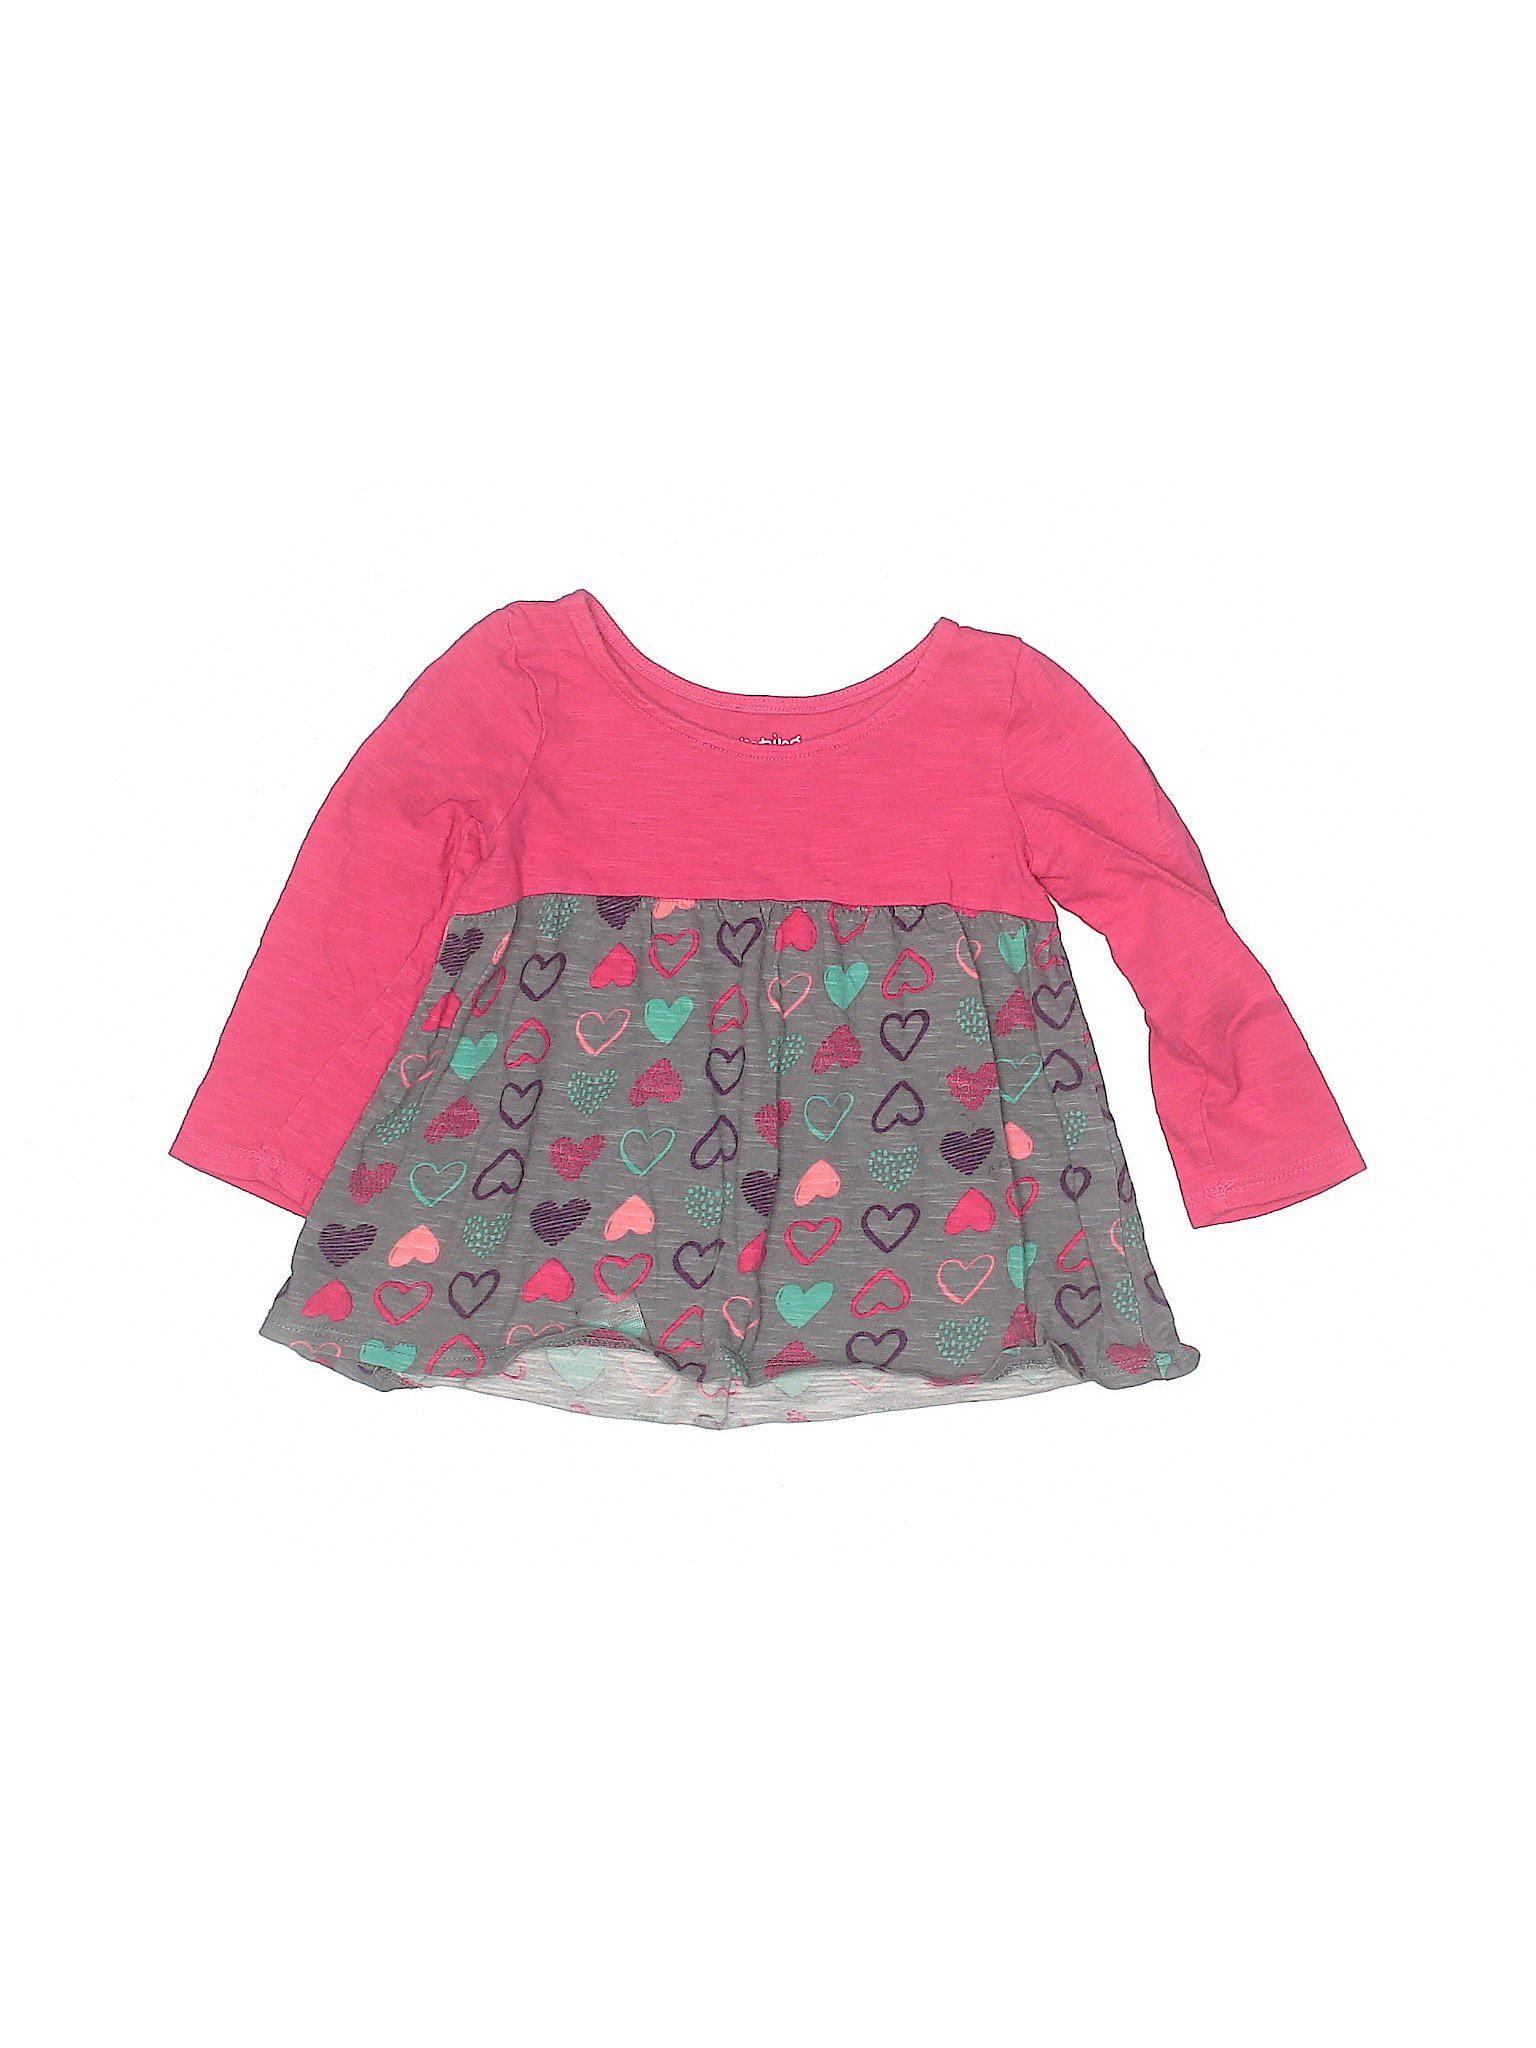 $10.00 $12.00  Each Wonderkids Toddler // Girls Velour Jacket Dress Sets